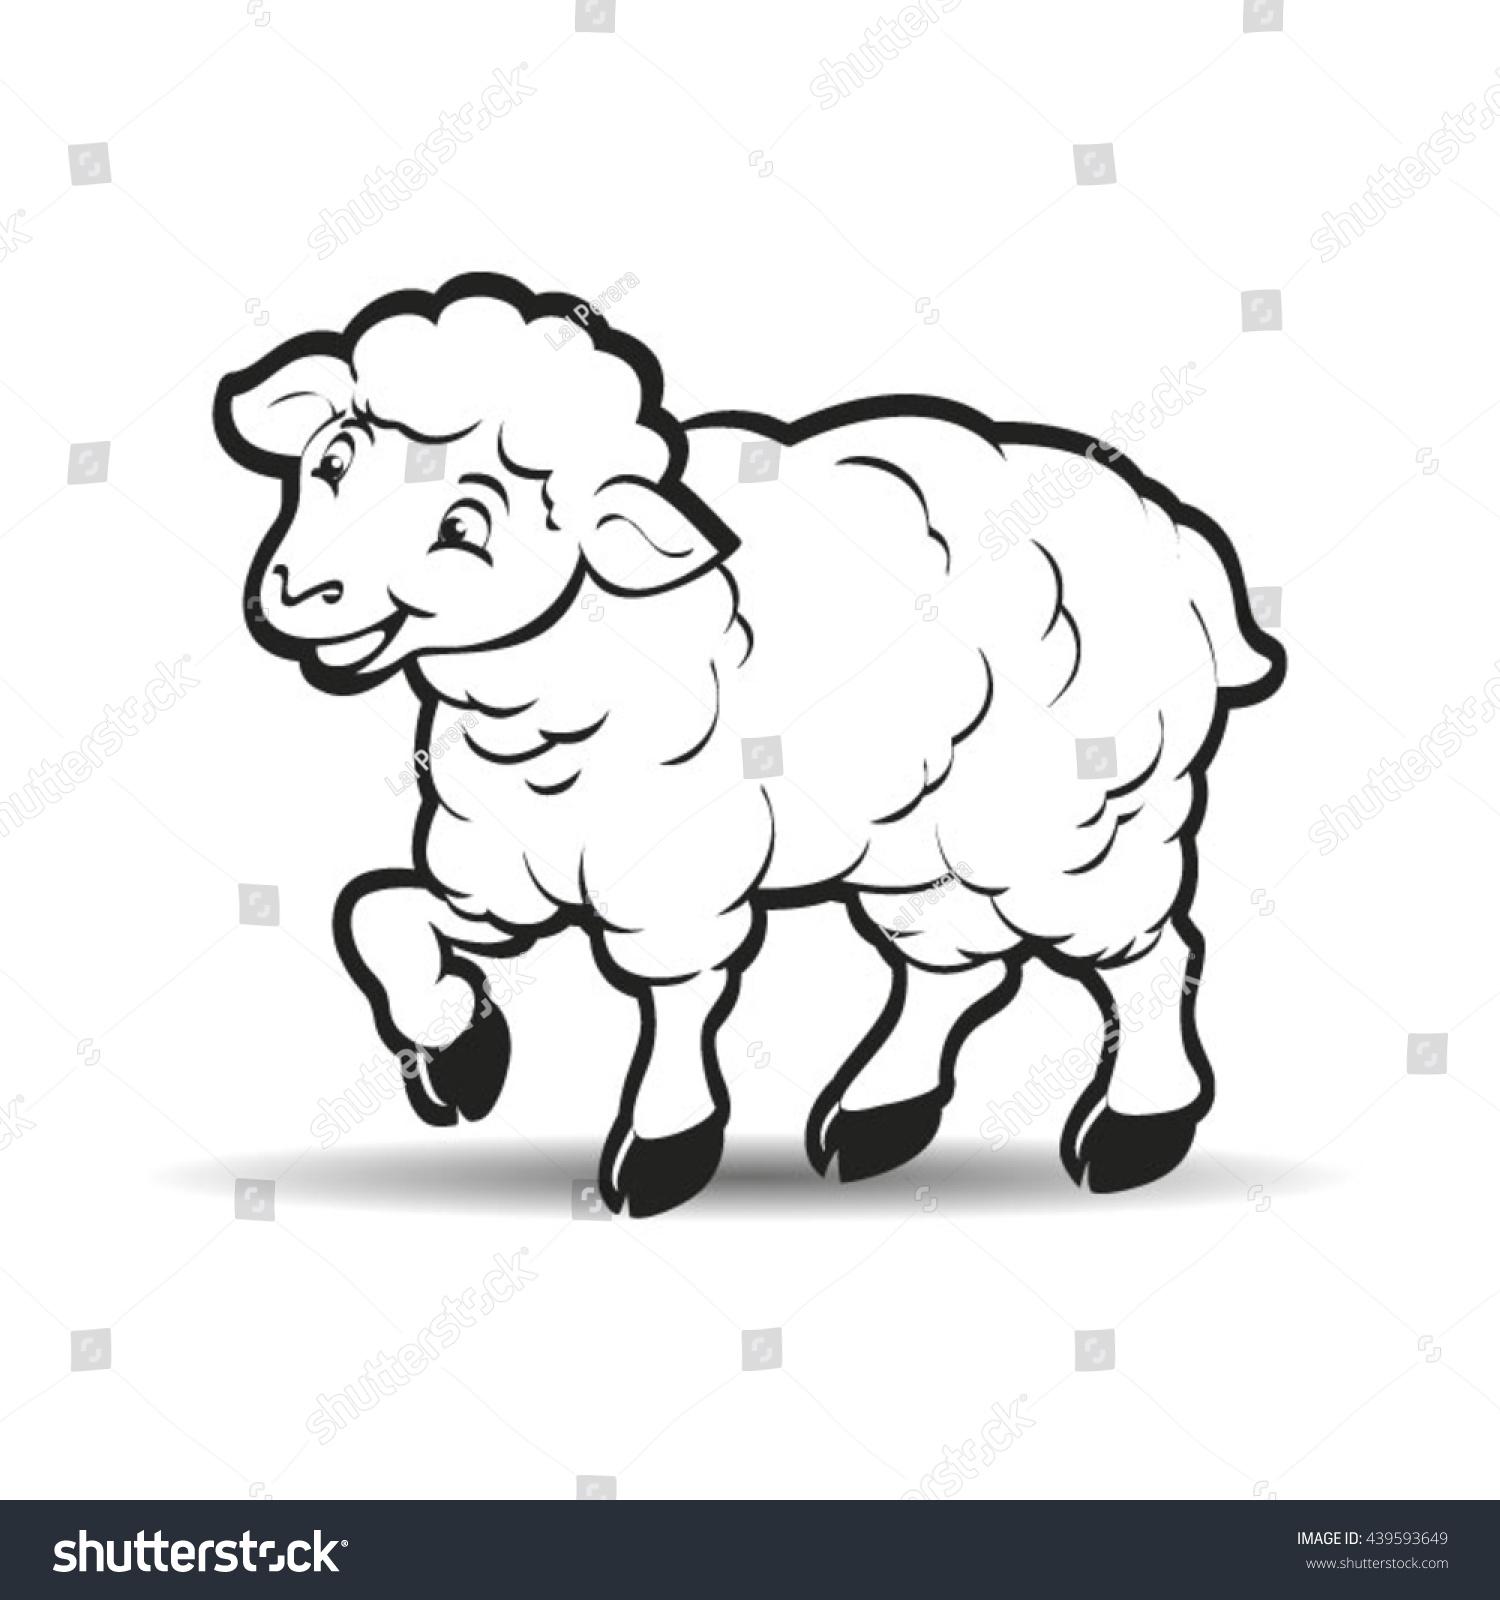 Happy Lamb Looking Forward Outlinevector Drawing Stock Vector ... for lamb drawing outline  535wja